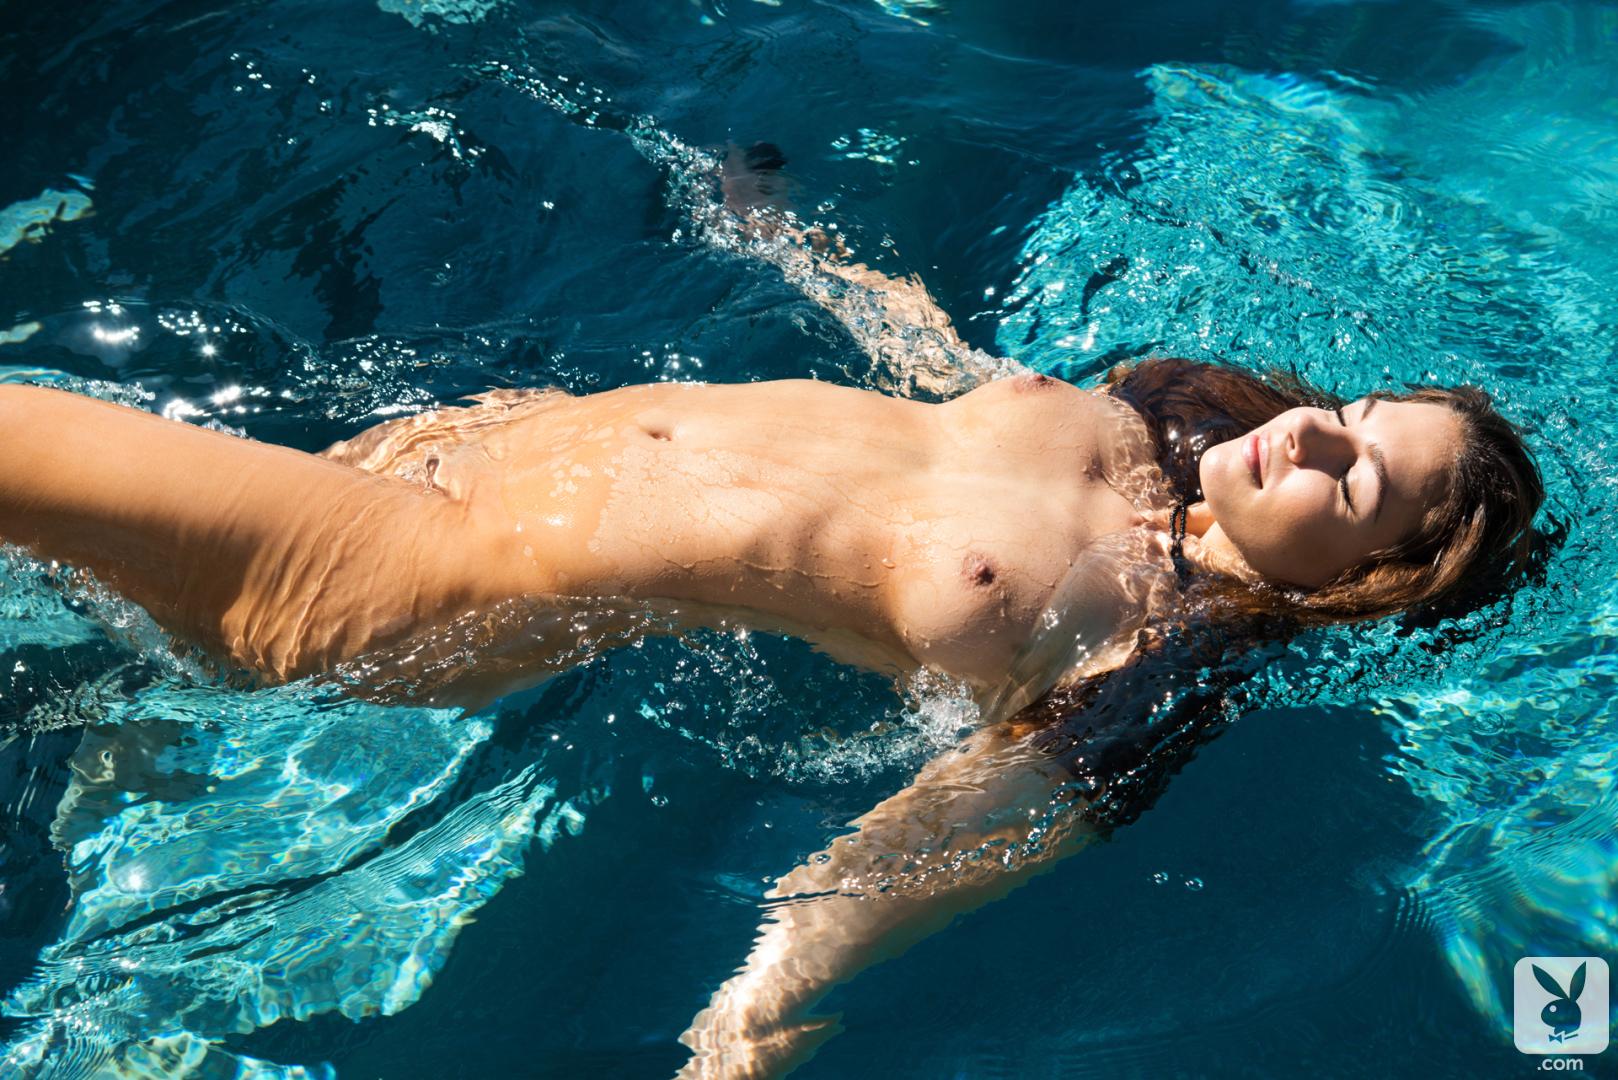 Nude girl swim photo